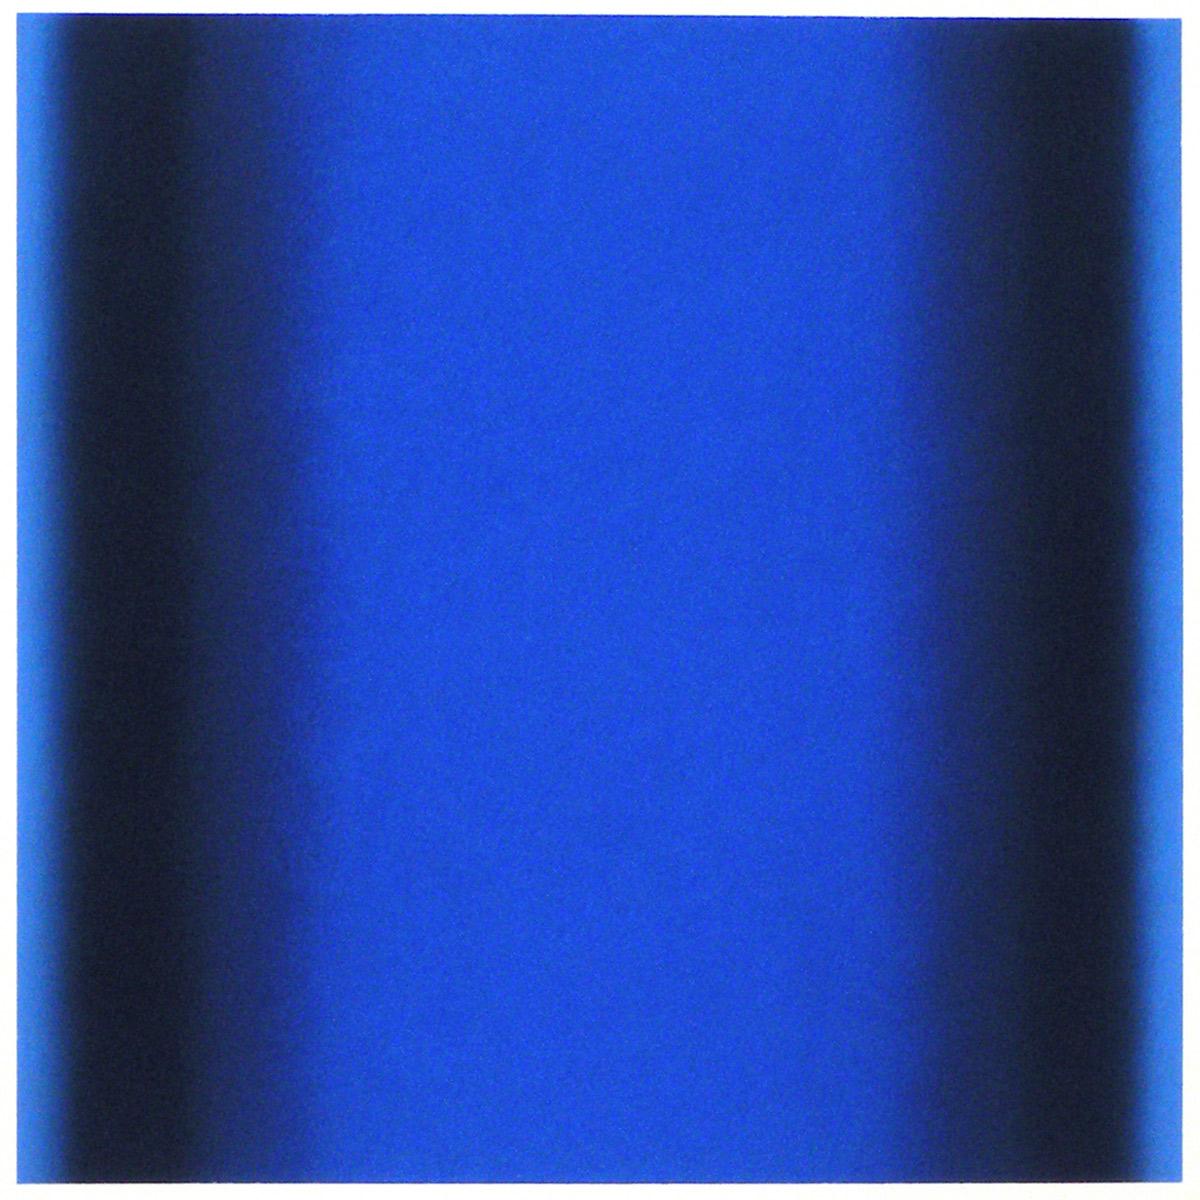 Cool-Light Ultramarine-Delft-Prussian, Interplay Series, 2012, pastel on paper, image: 14 x 14 in. (36 x 36 cm.), sheet: 30 x 22 in. (76 x 56 cm.)